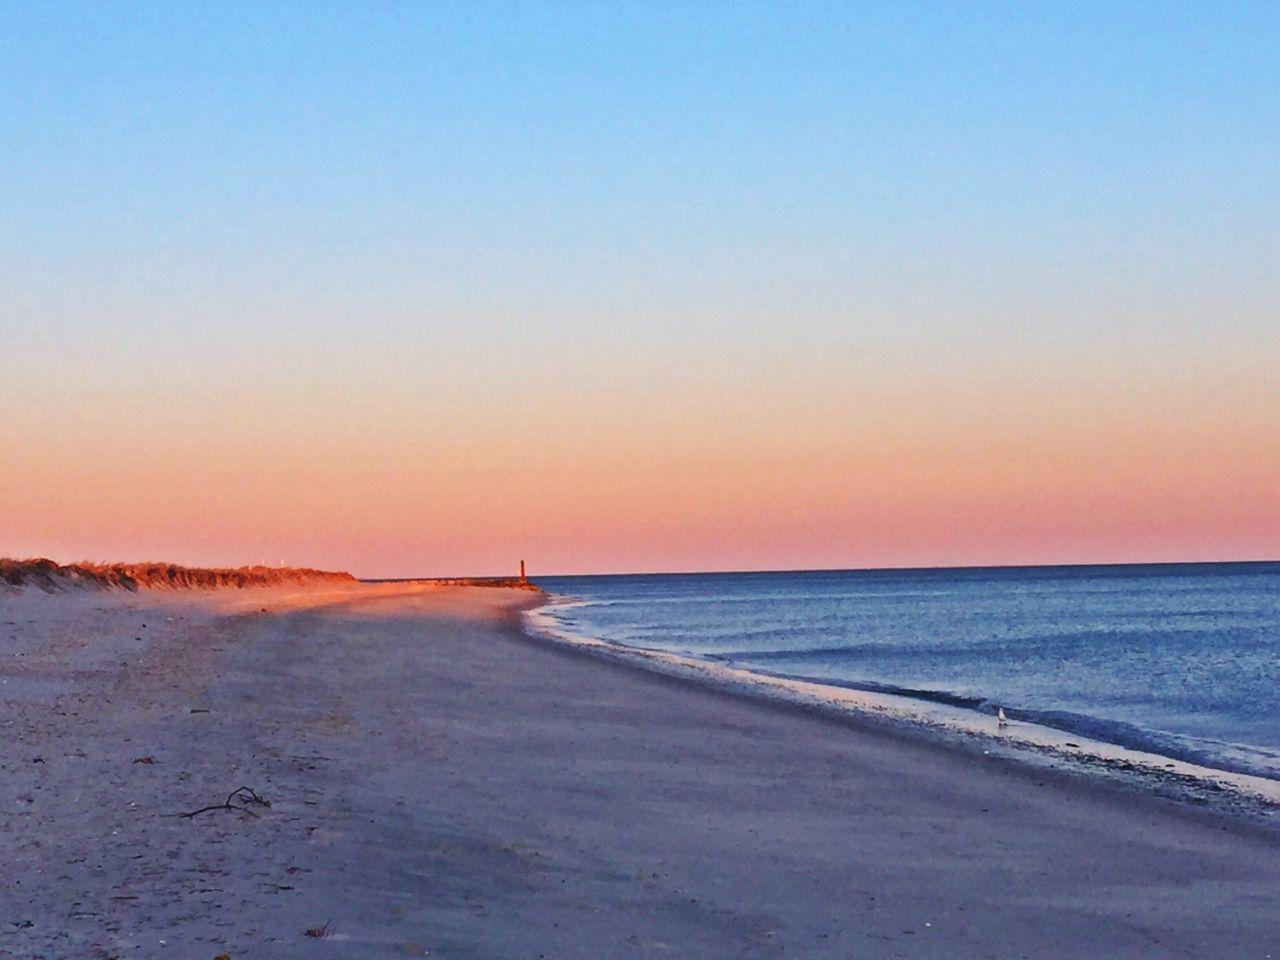 Cape Cod Sunset Scenic Island Getaway Barrier Island